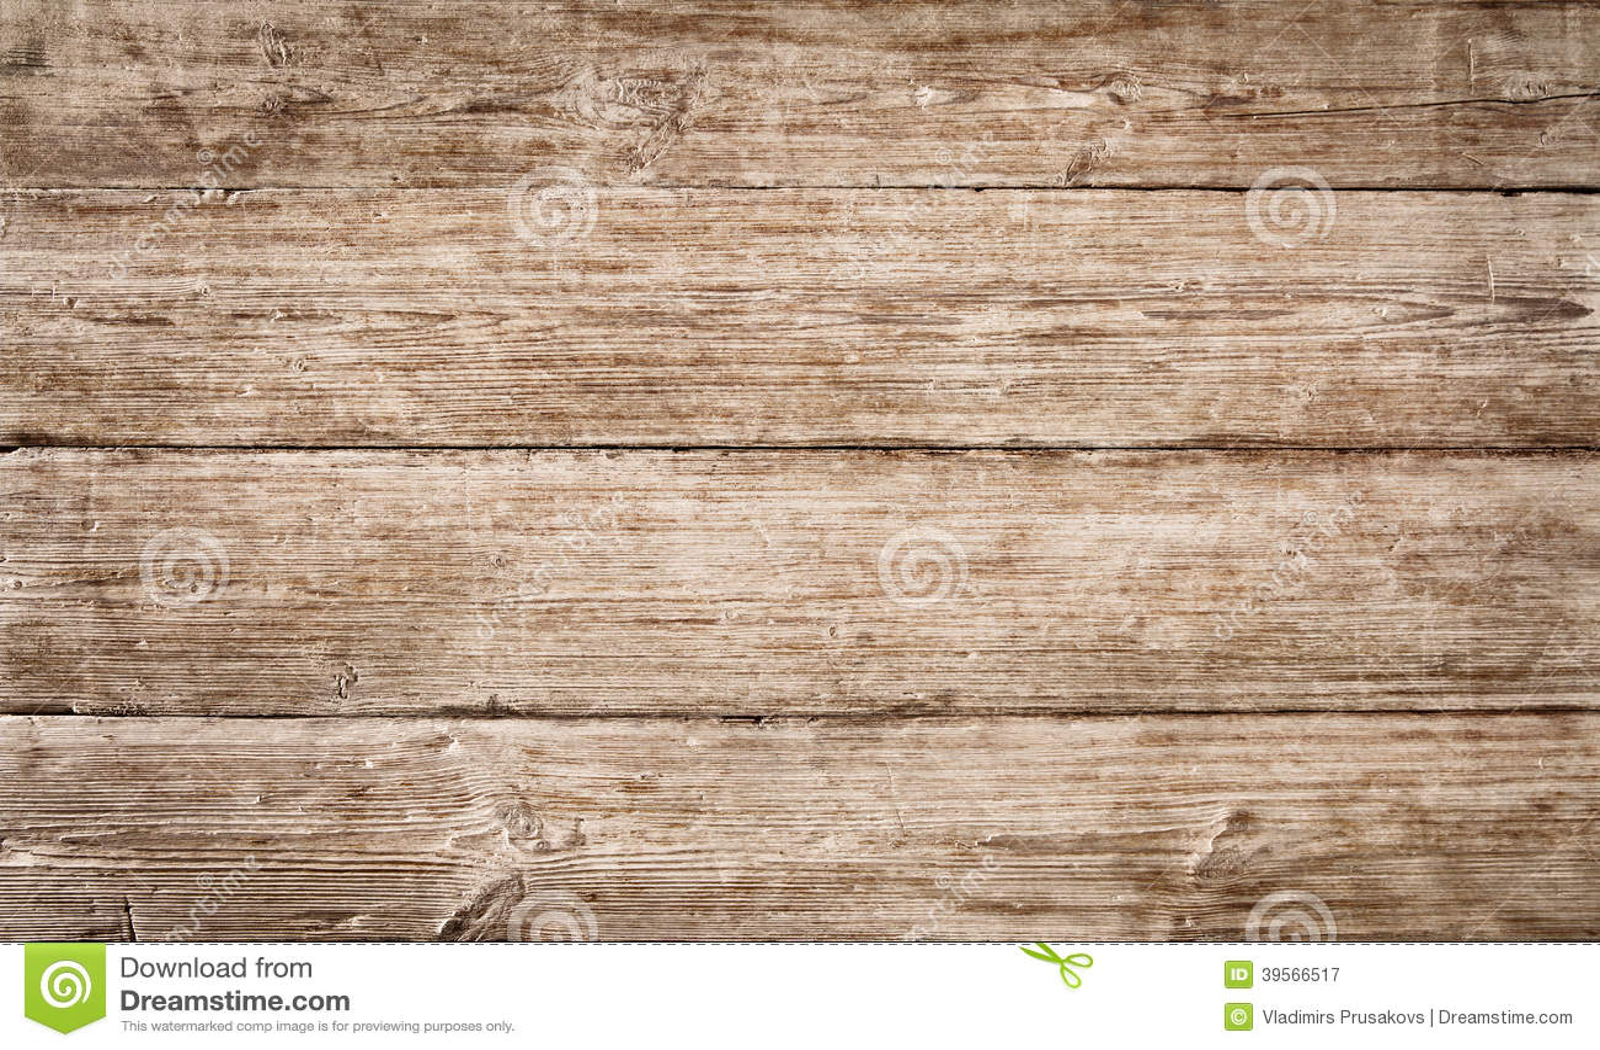 Wood plank grain texture, wooden board striped old fiber